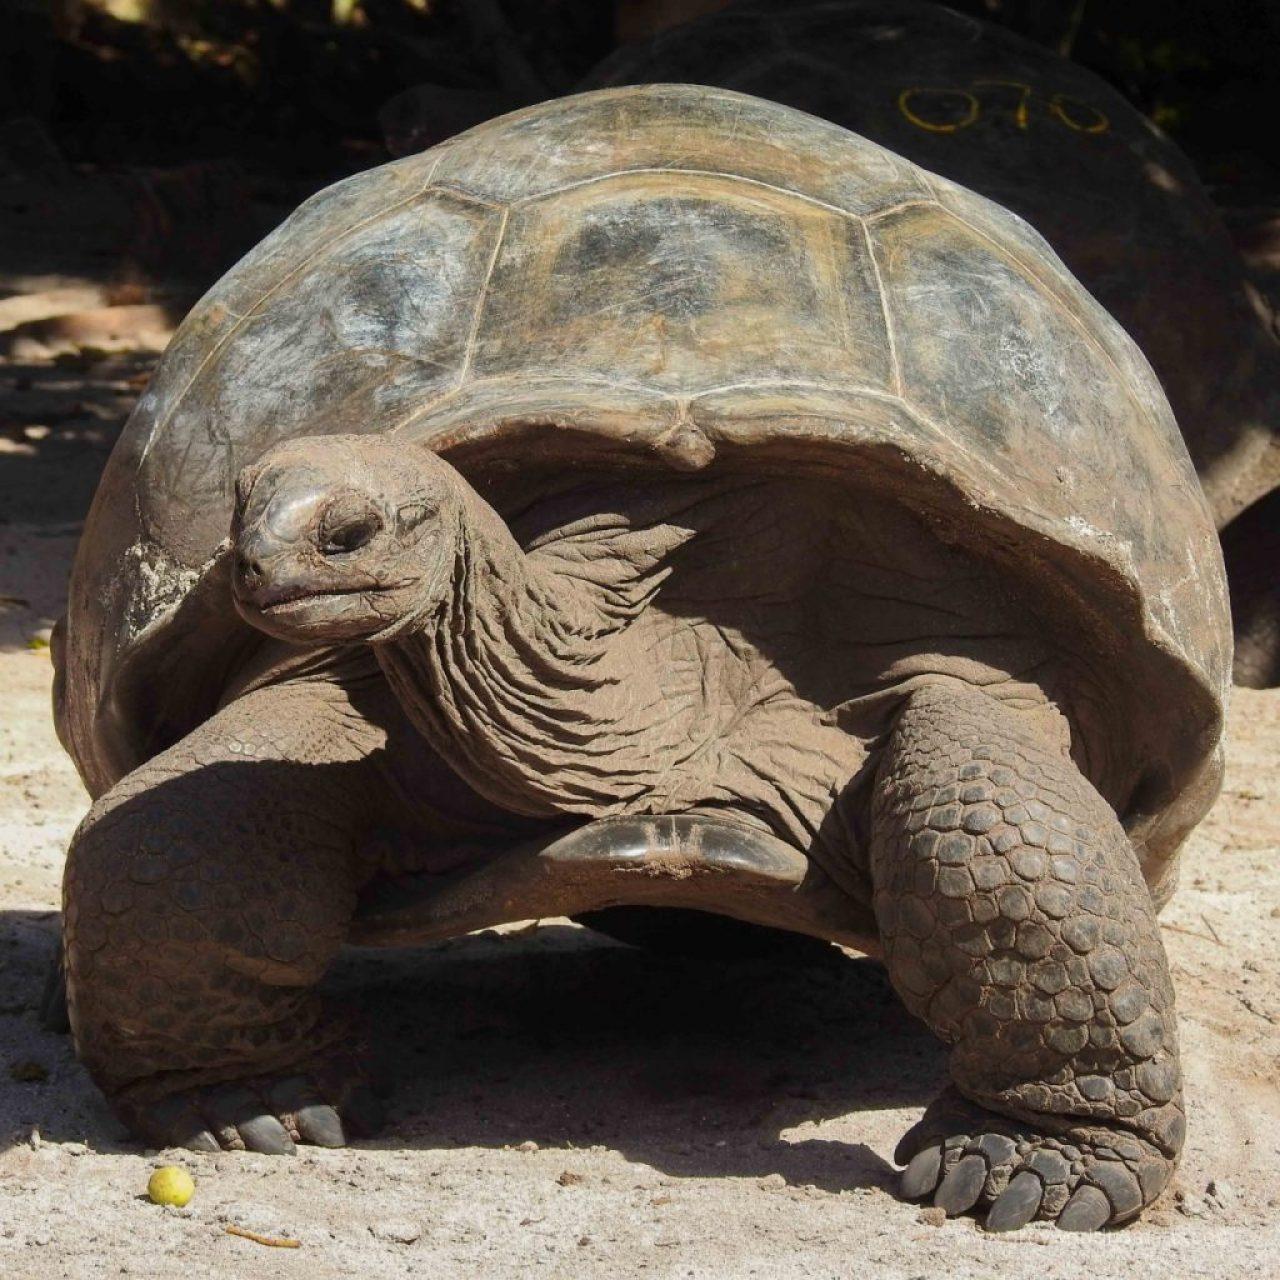 turtle island seychelles, ile curieuse seychelles, ile de tortues